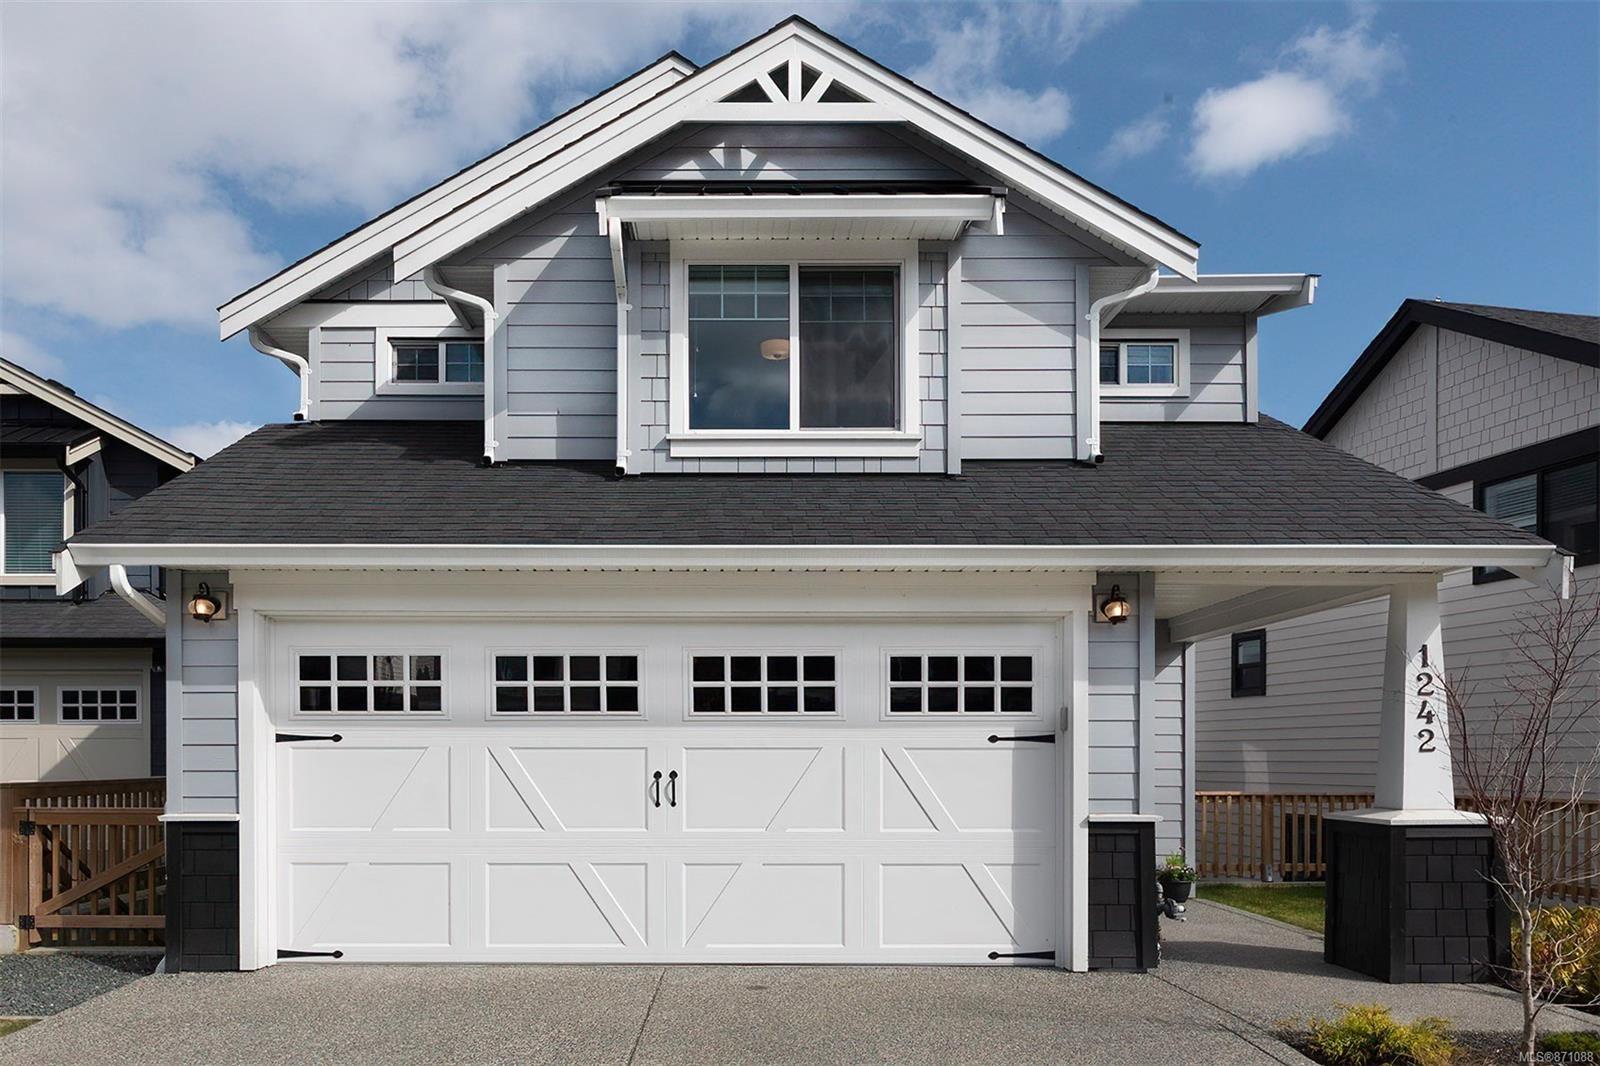 Main Photo: 1242 Nova Crt in : La Westhills House for sale (Langford)  : MLS®# 871088